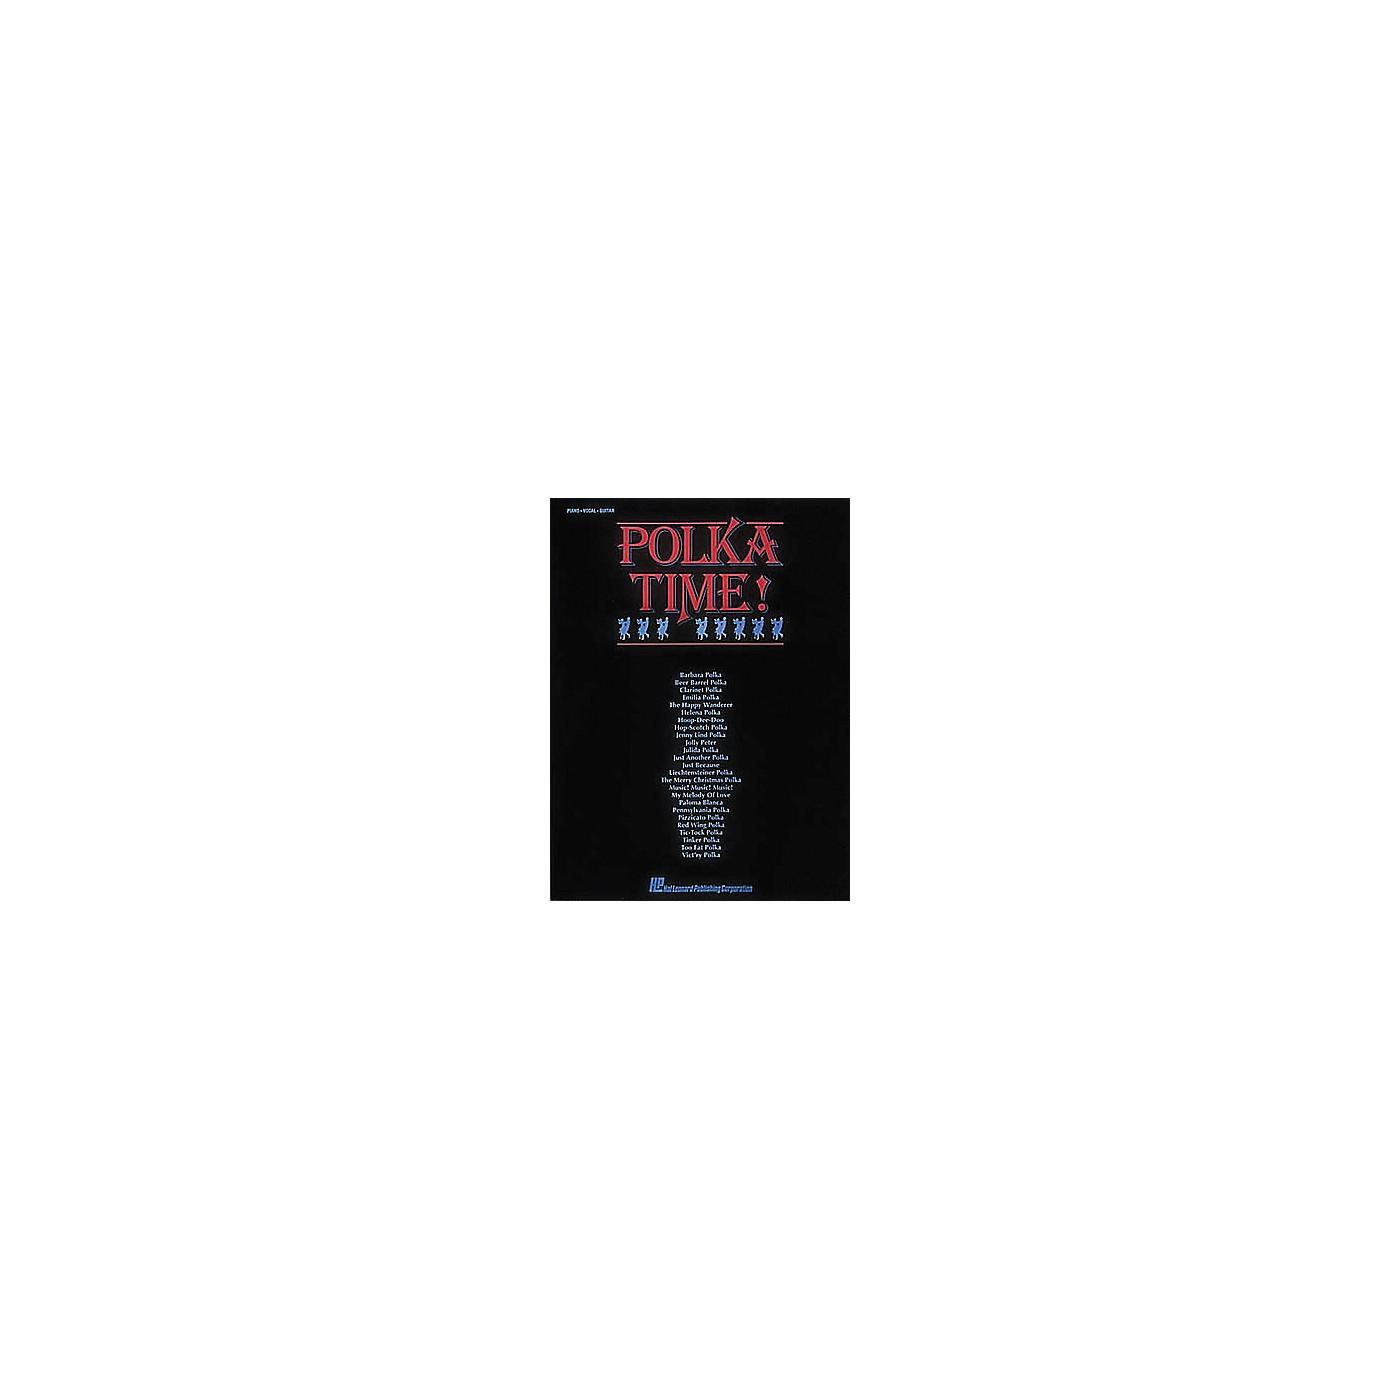 Hal Leonard Polka Time! Piano/Vocal/Guitar Songbook thumbnail